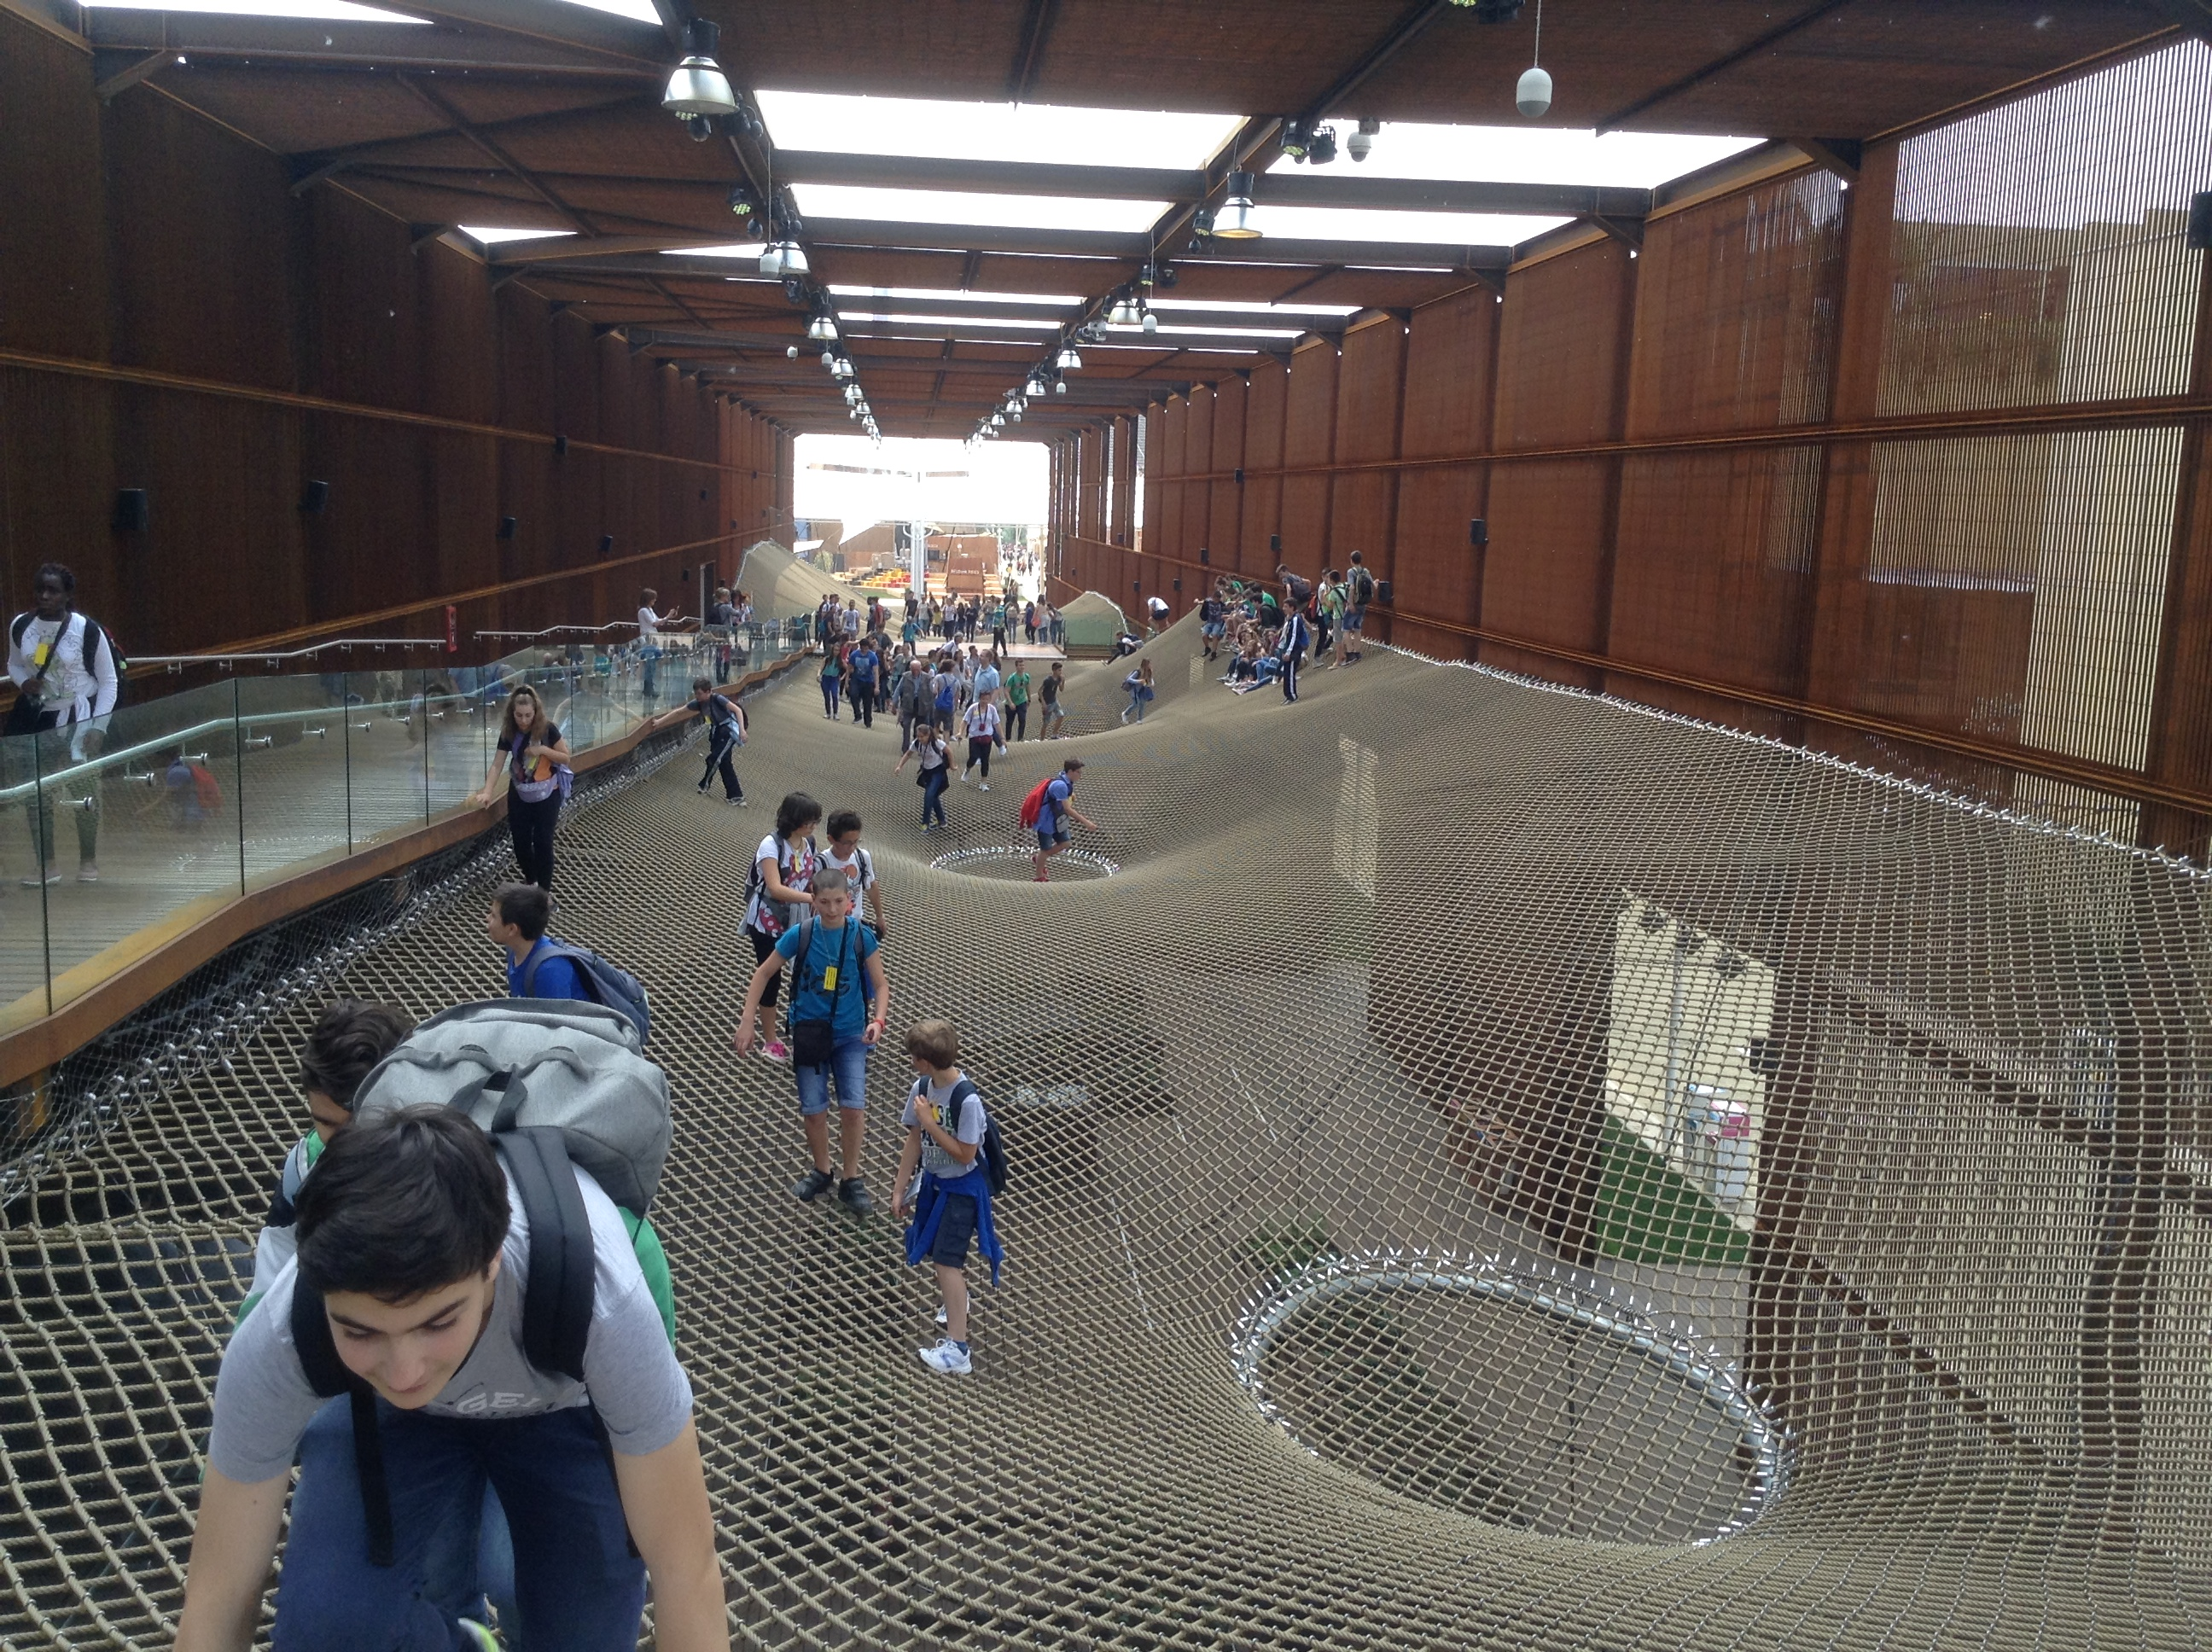 Brazilian pavilion, Milano Expo 2015, MilanKaRaja